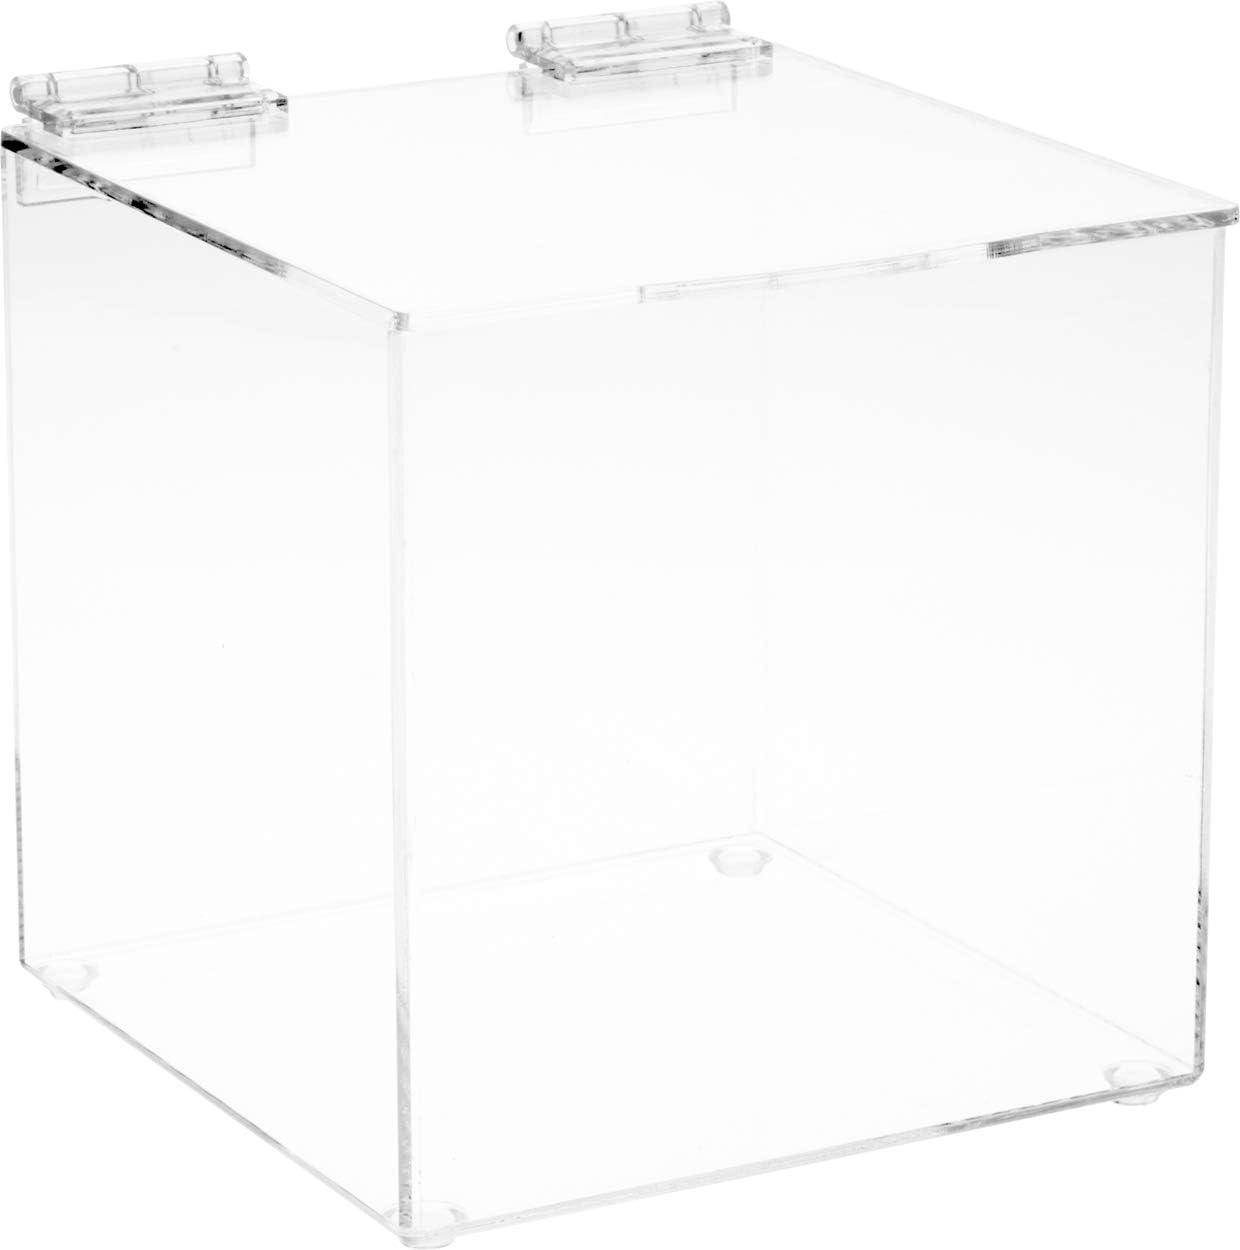 Plymor Clear Acrylic 本店 Display Case 価格 交渉 送料無料 Box with Lid 6